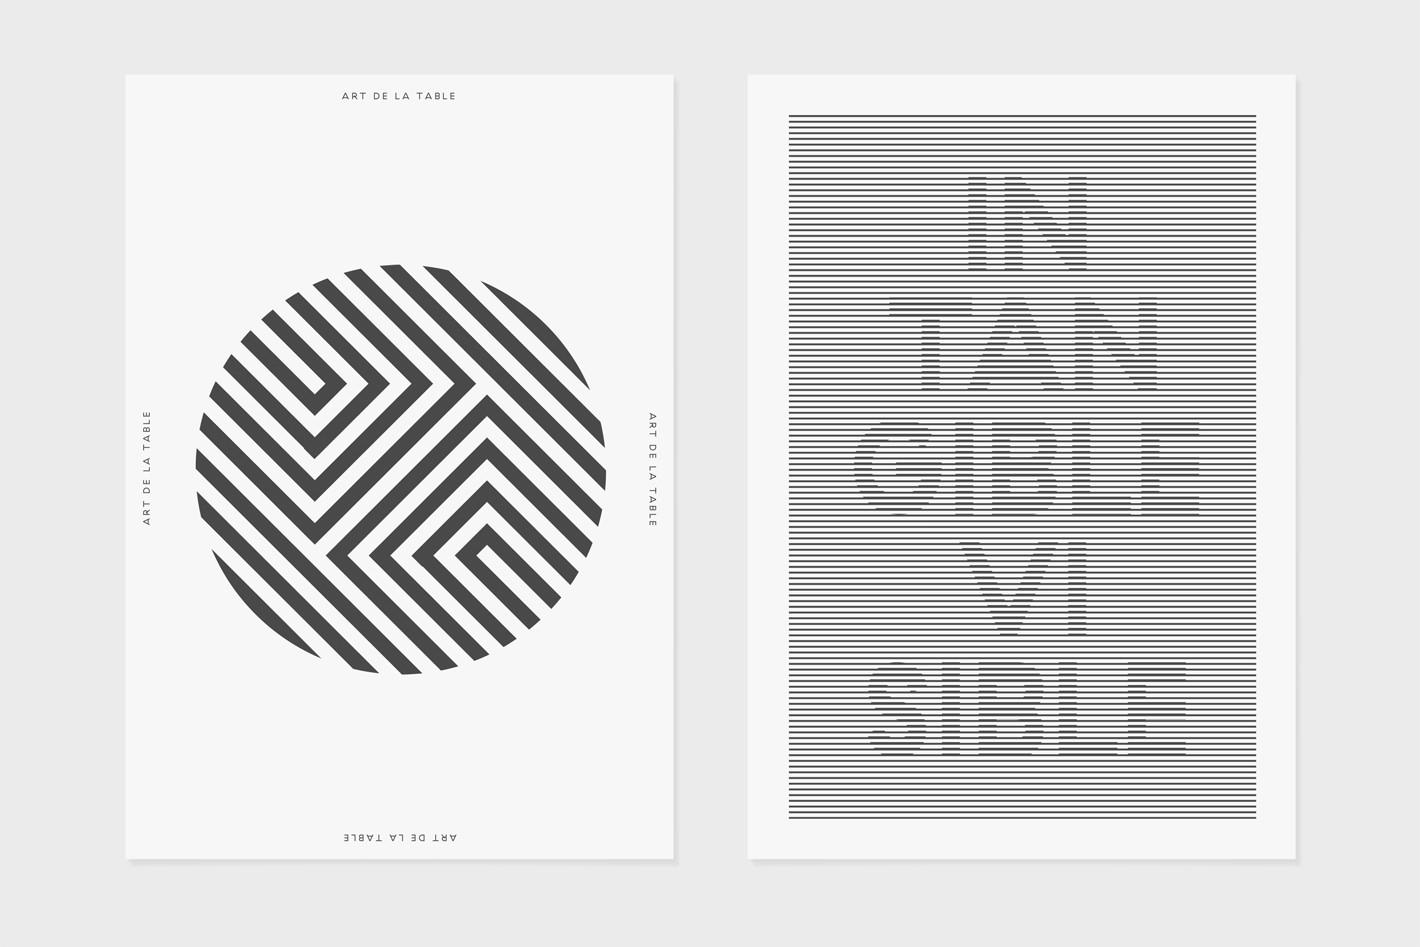 Figure-Jeremy-Hall-Design-Graphique-Logo-Branding-Image-De-Marque-Jelimagine-6.jpg